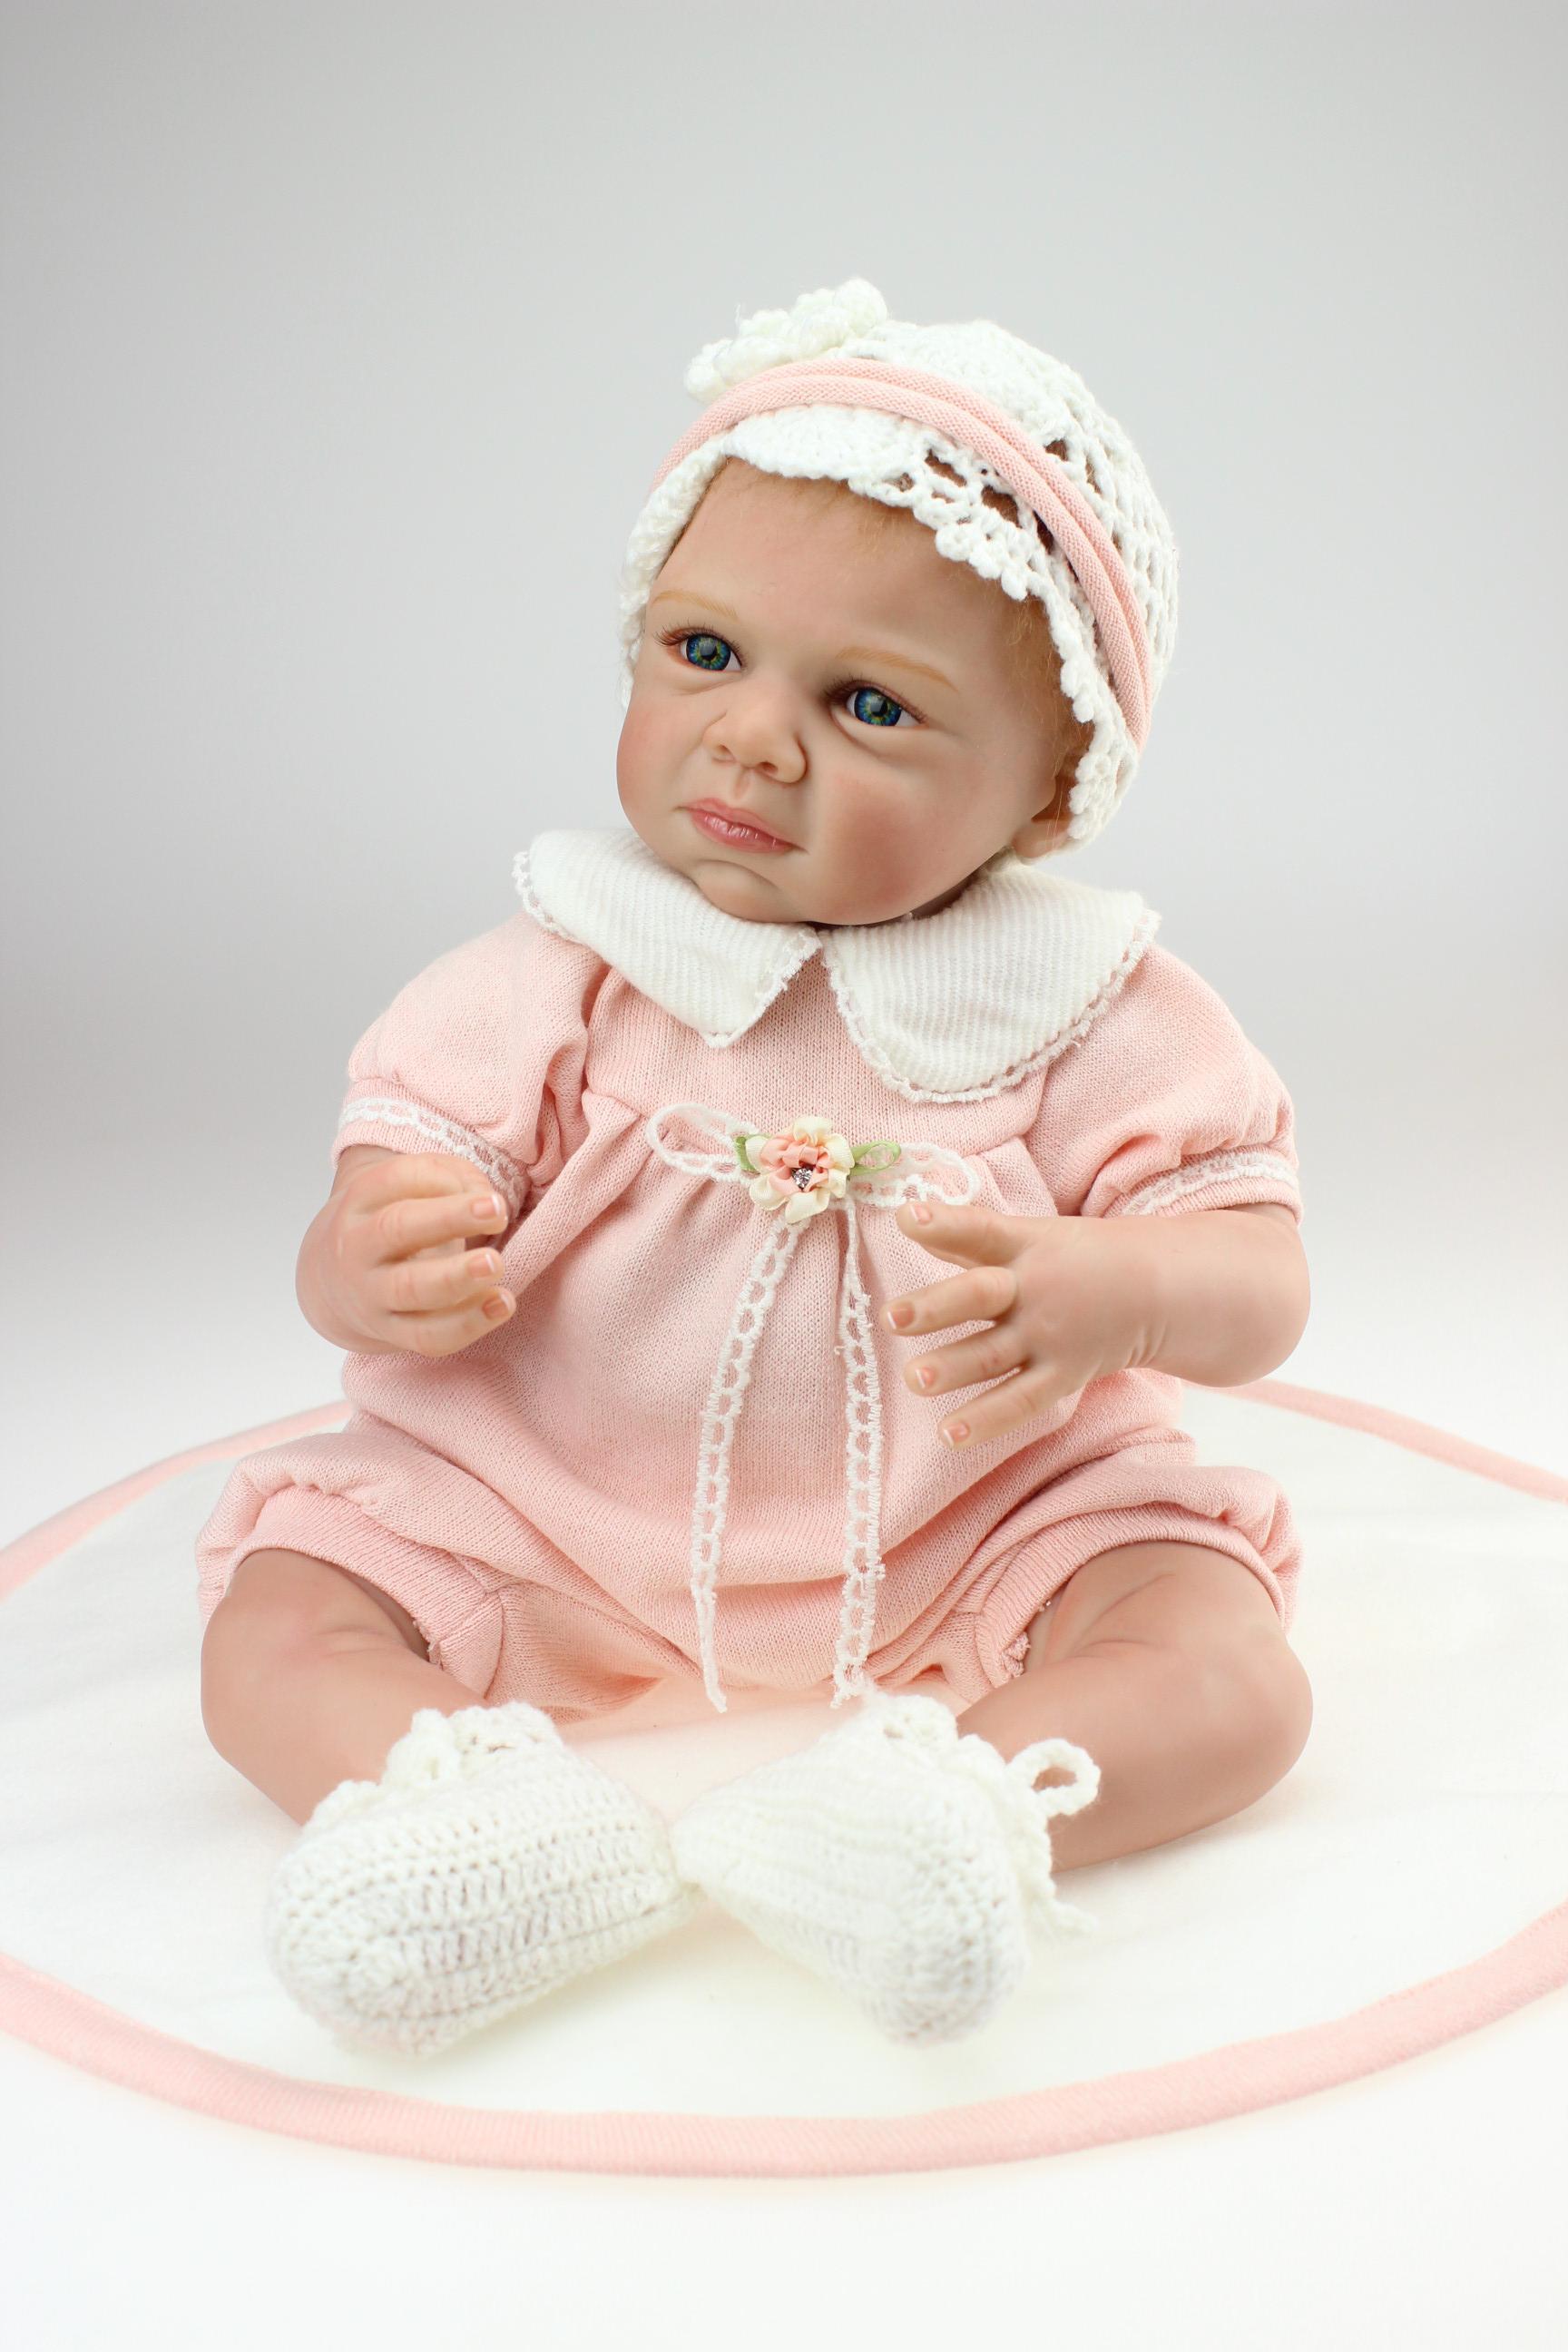 21 50cm Vinyl Silicone Reborn Baby Doll Lifelike Sad Face